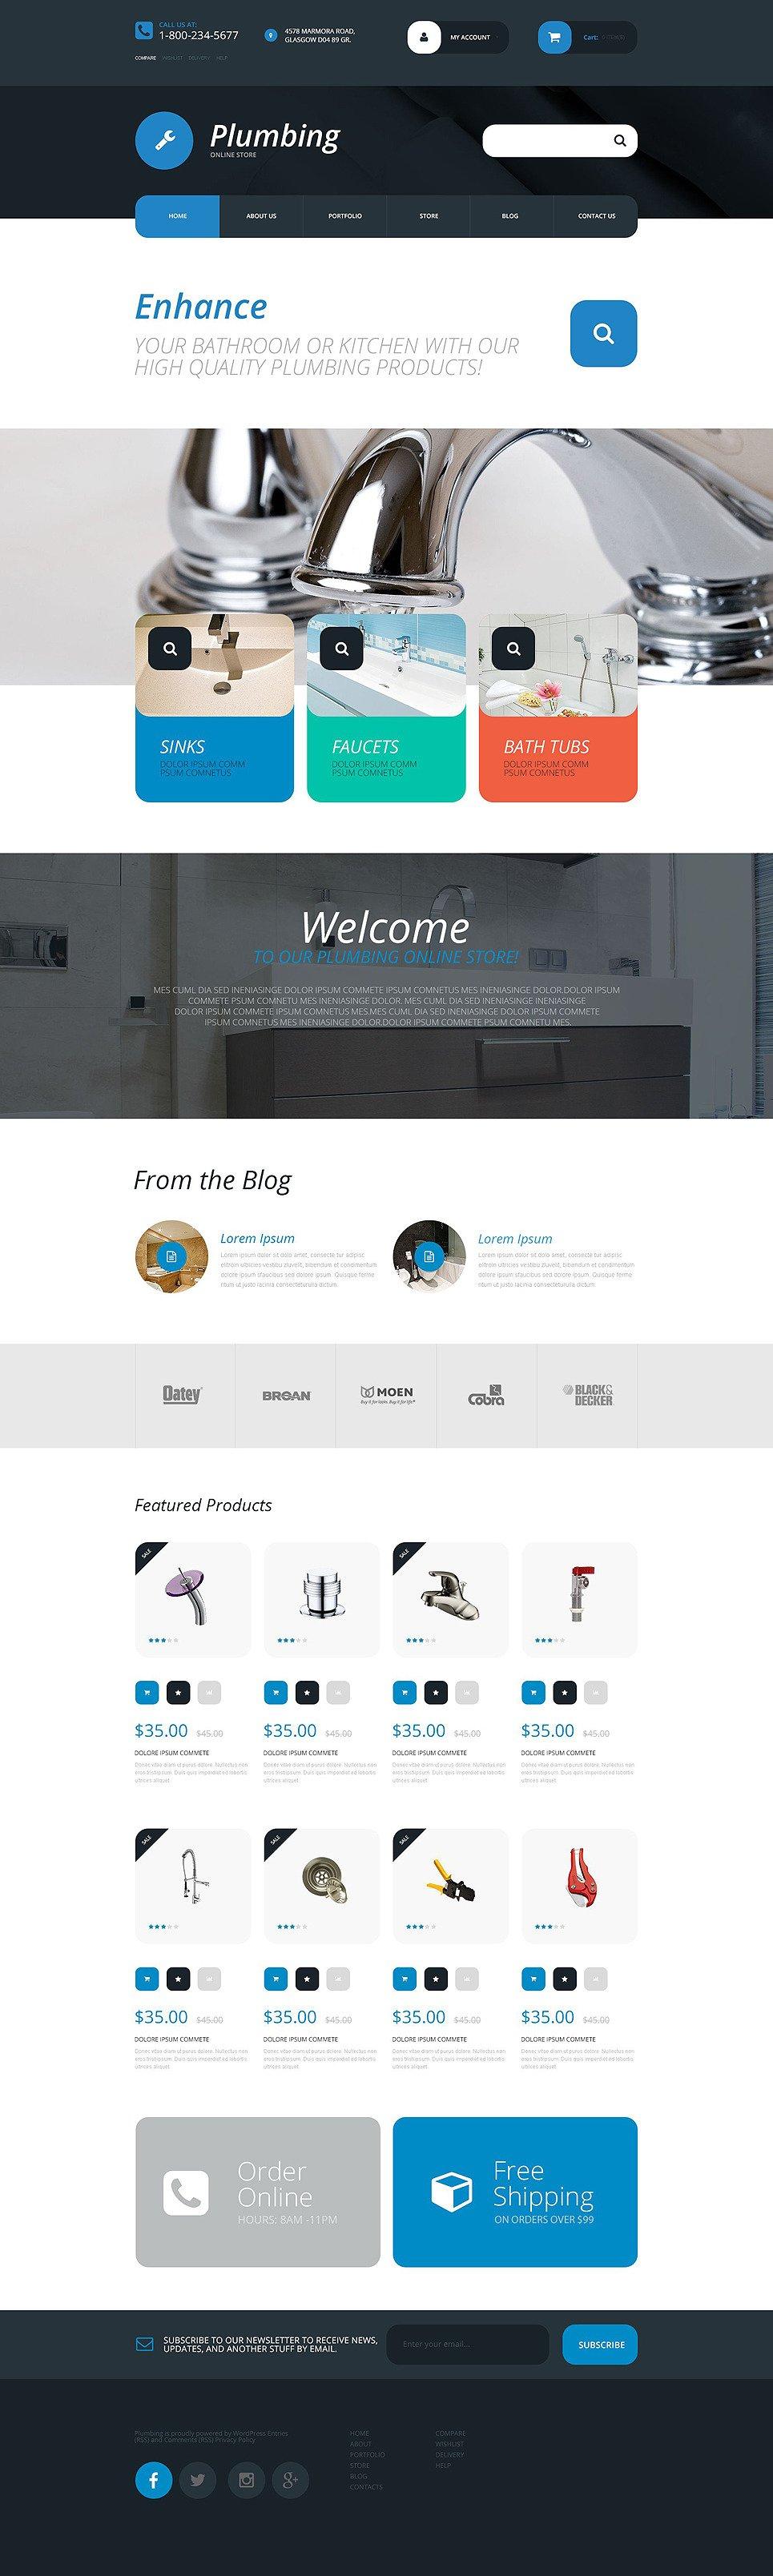 Plumbing Supplies Store WooCommerce Theme New Screenshots BIG